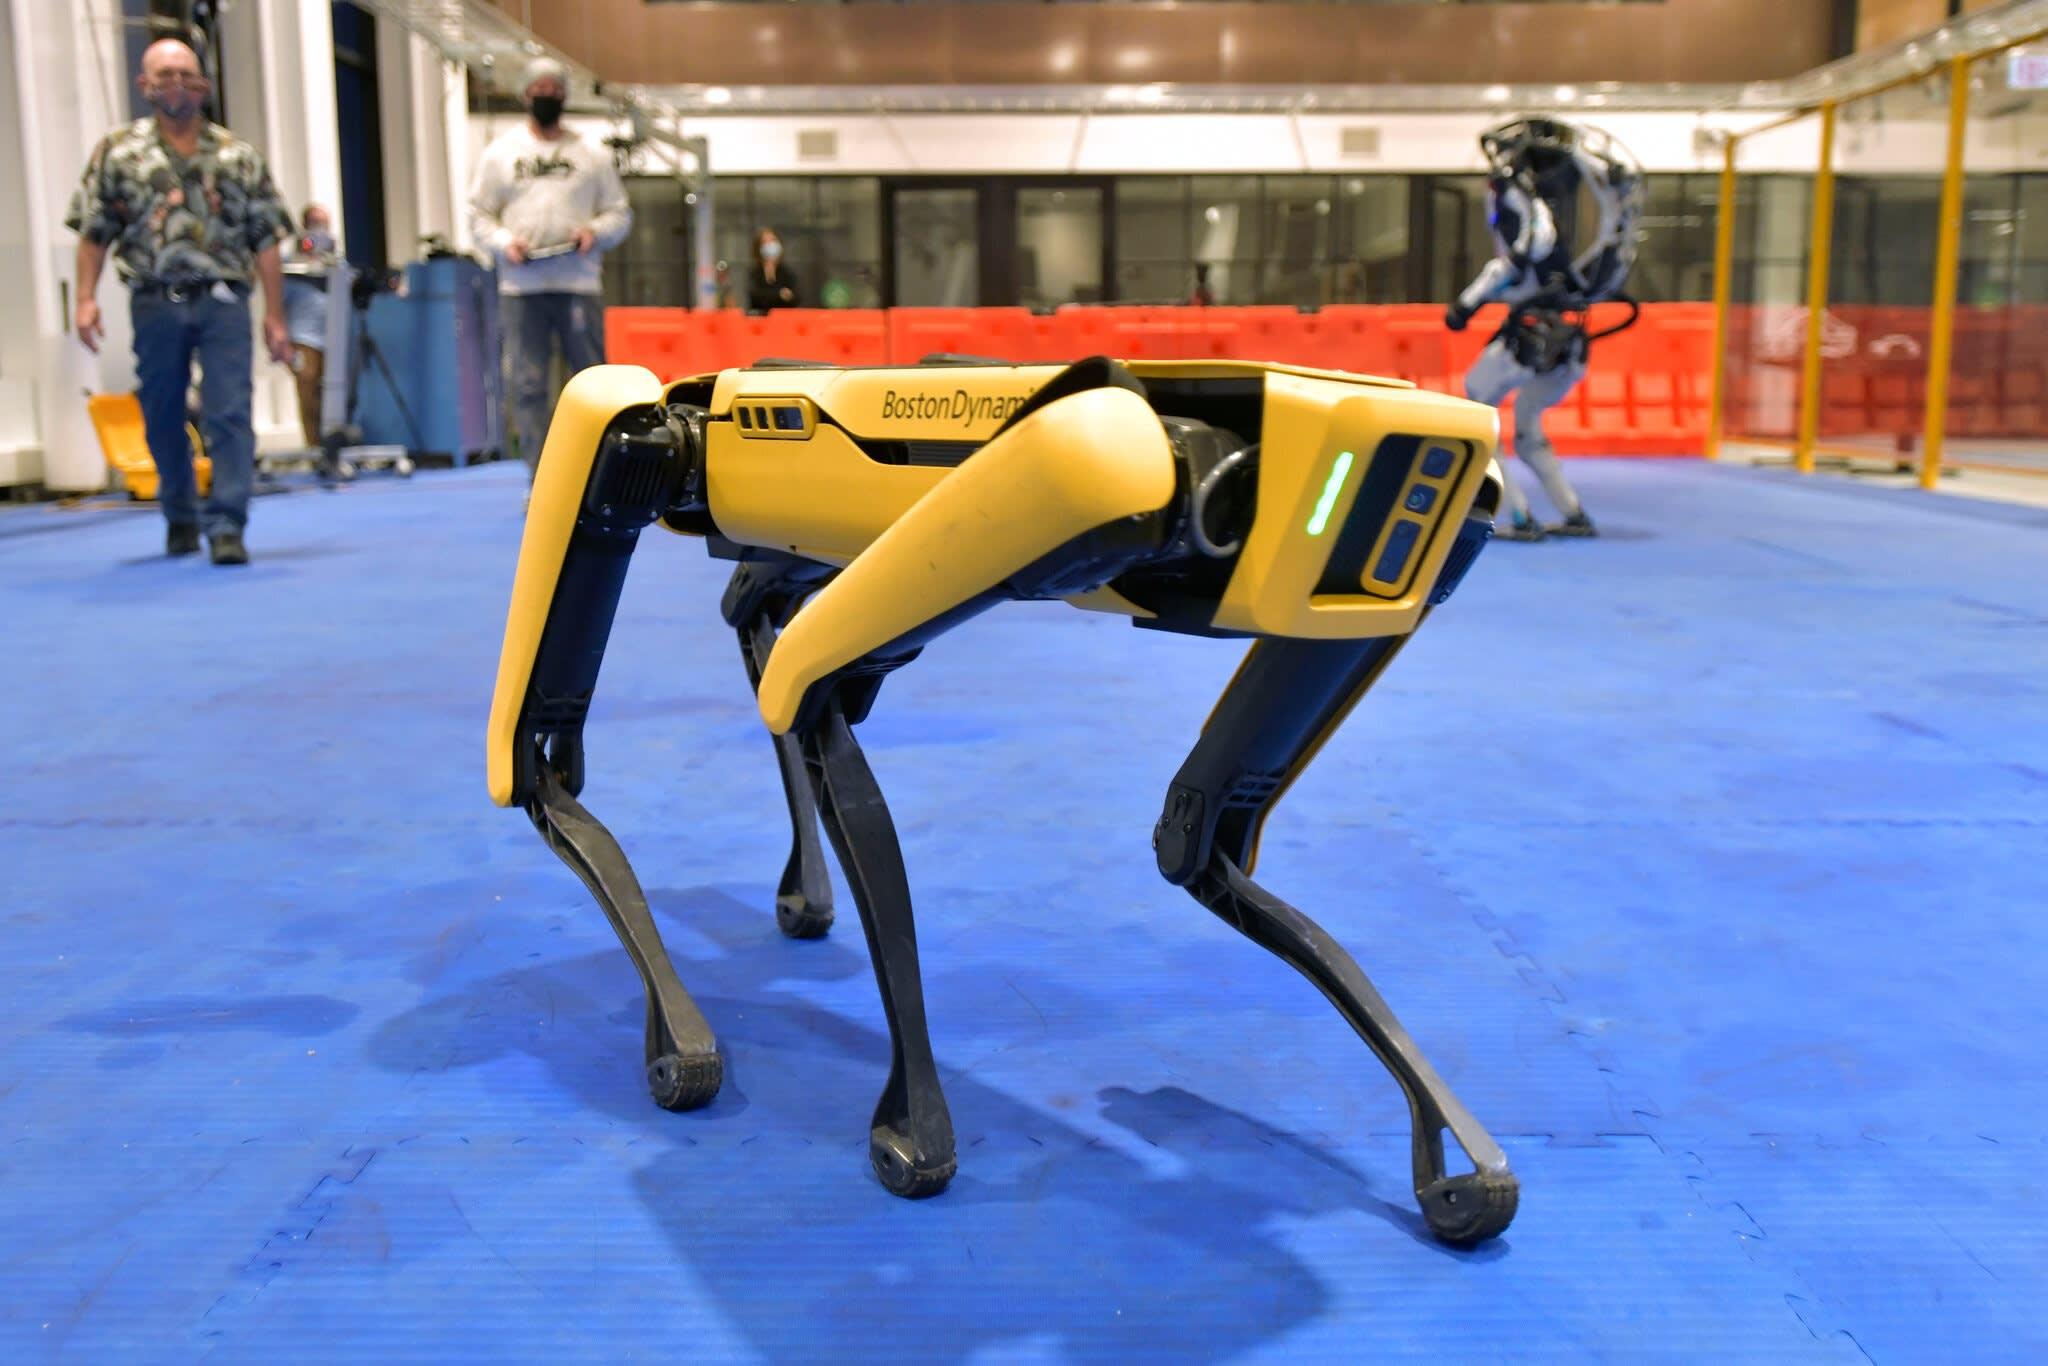 N.Y.P.D. Robot Dog's Run Is Cut Short After Fierce Backlash